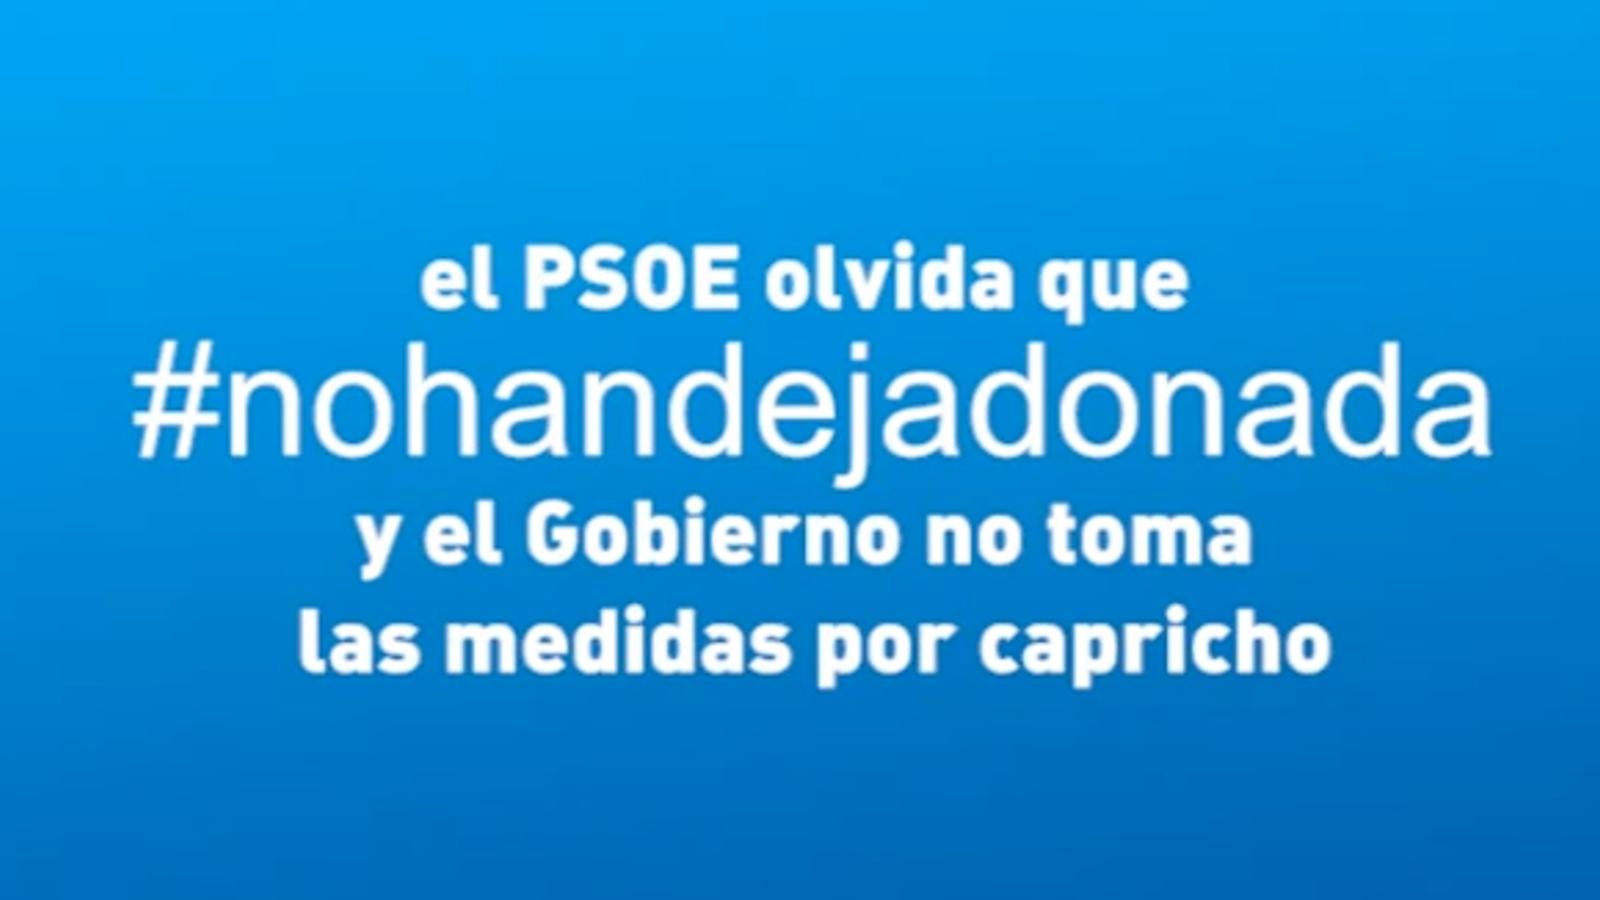 Guerra de vídeos entre PSOE i PP amb #vanaportodo i #nohandejadonada